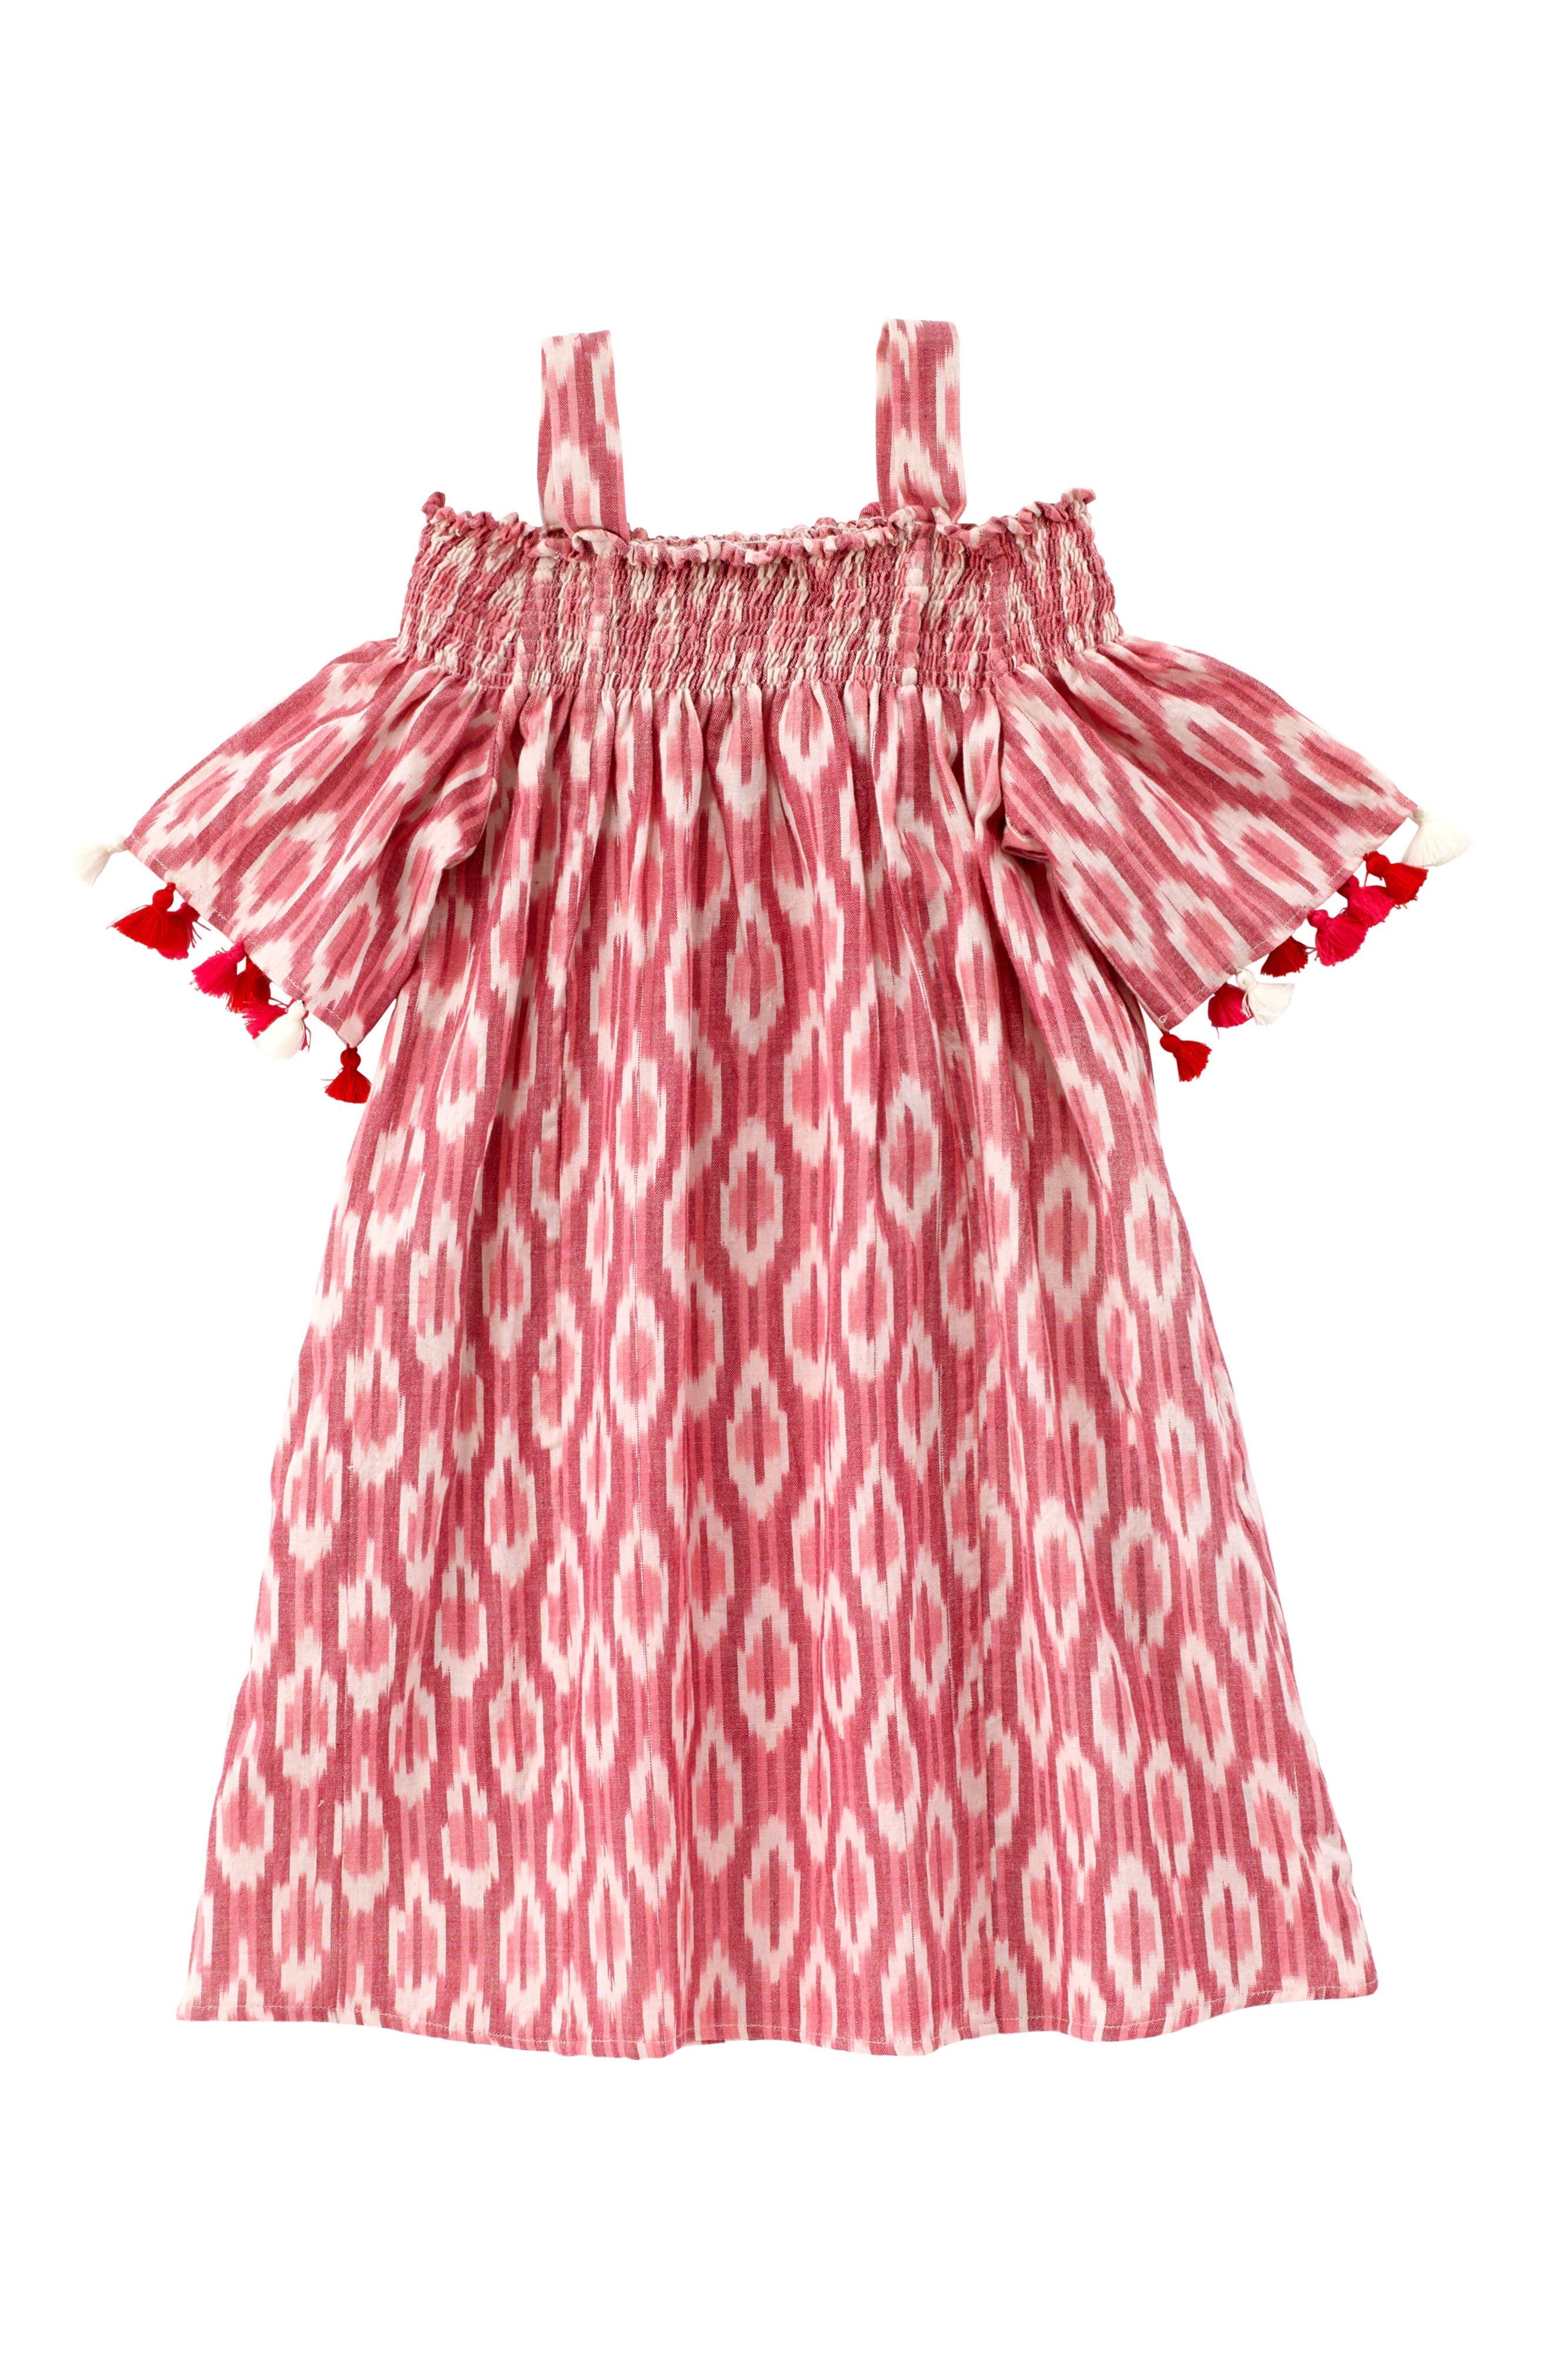 Main Image - Masala Baby Rohi Ikat Print Dress (Toddler Girls, Little Girls & Big Girls)